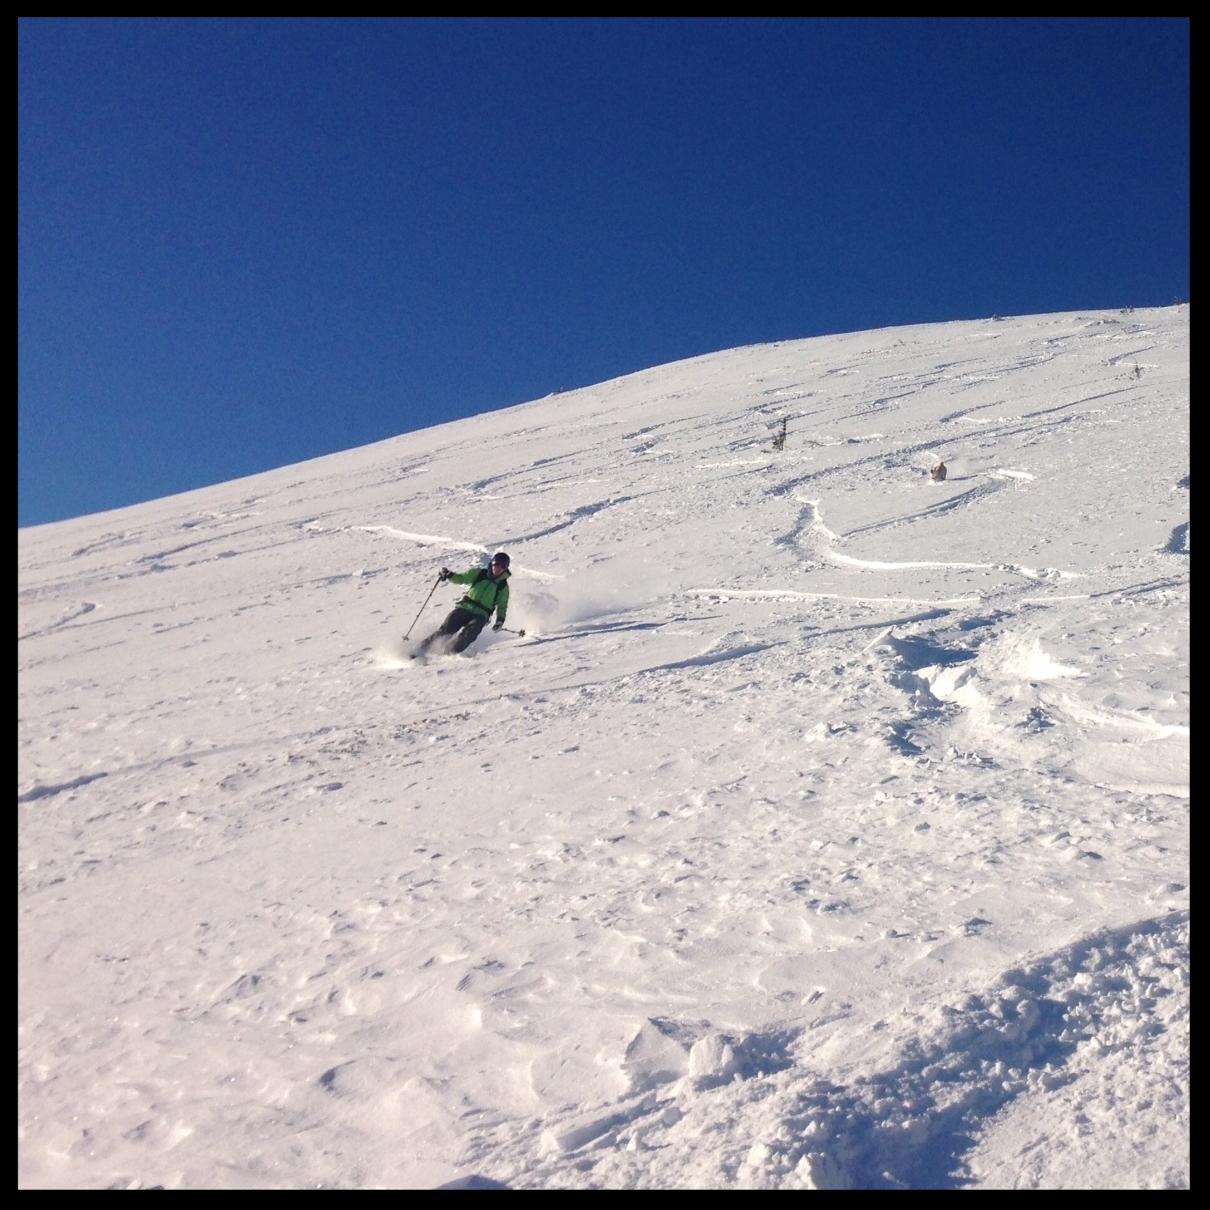 A beginners guide to backcountry ski bindings